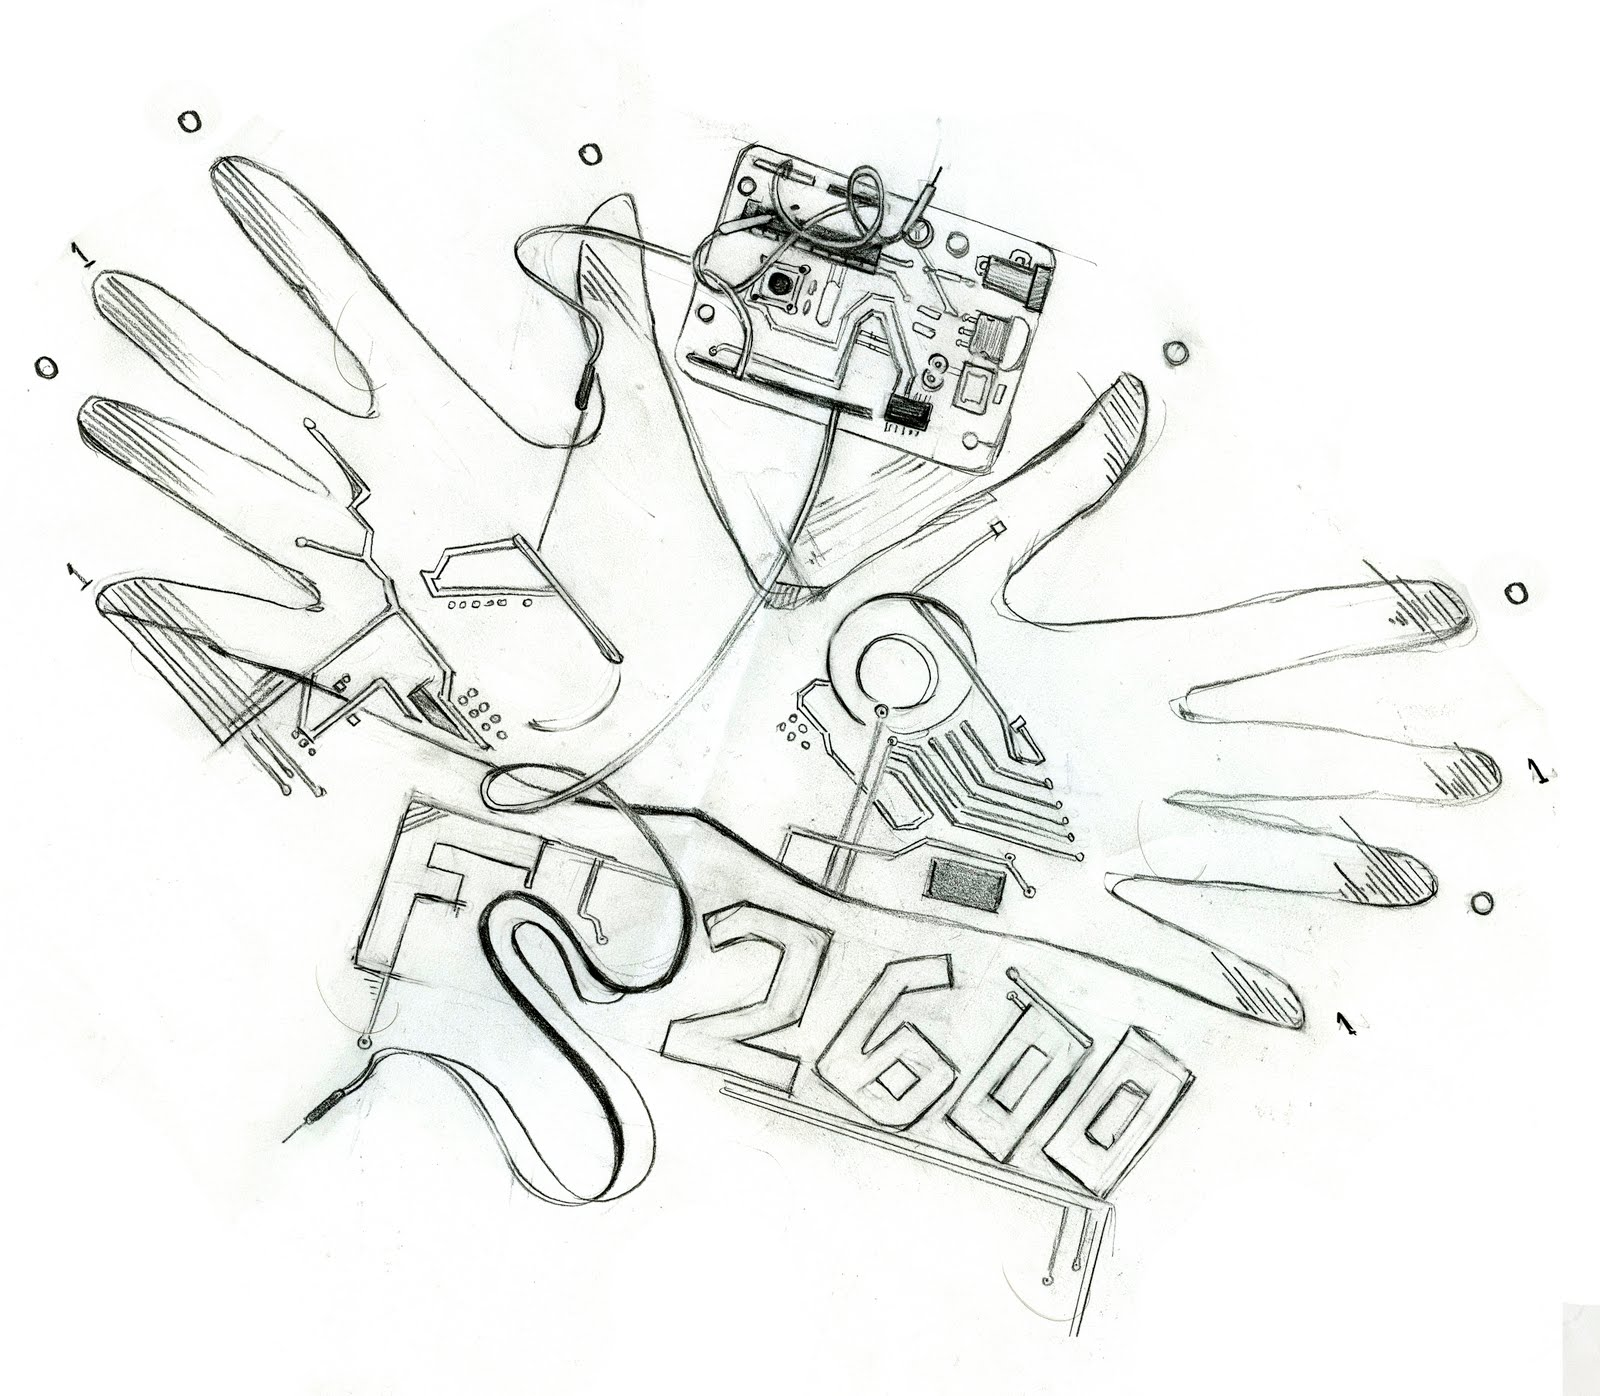 Shirt design sketches - Computer Club T Shirt Design